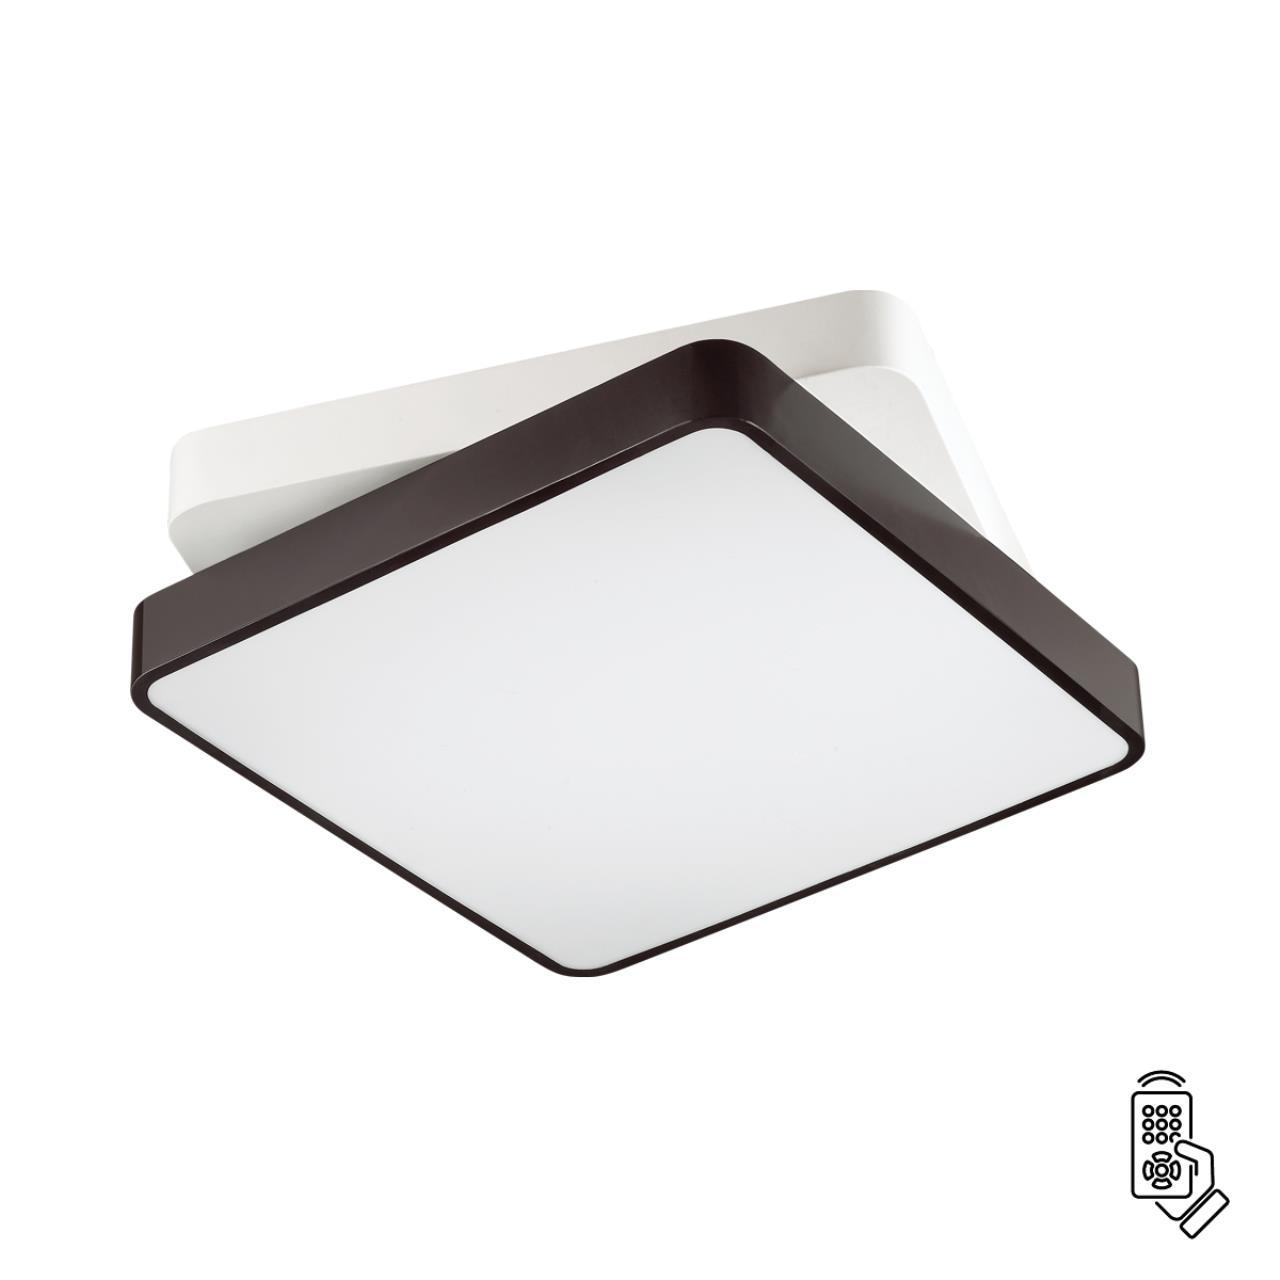 4511/72CL LEDIO LN20 белый, черный Люстра потолочная LED 72W 220V AGATHA